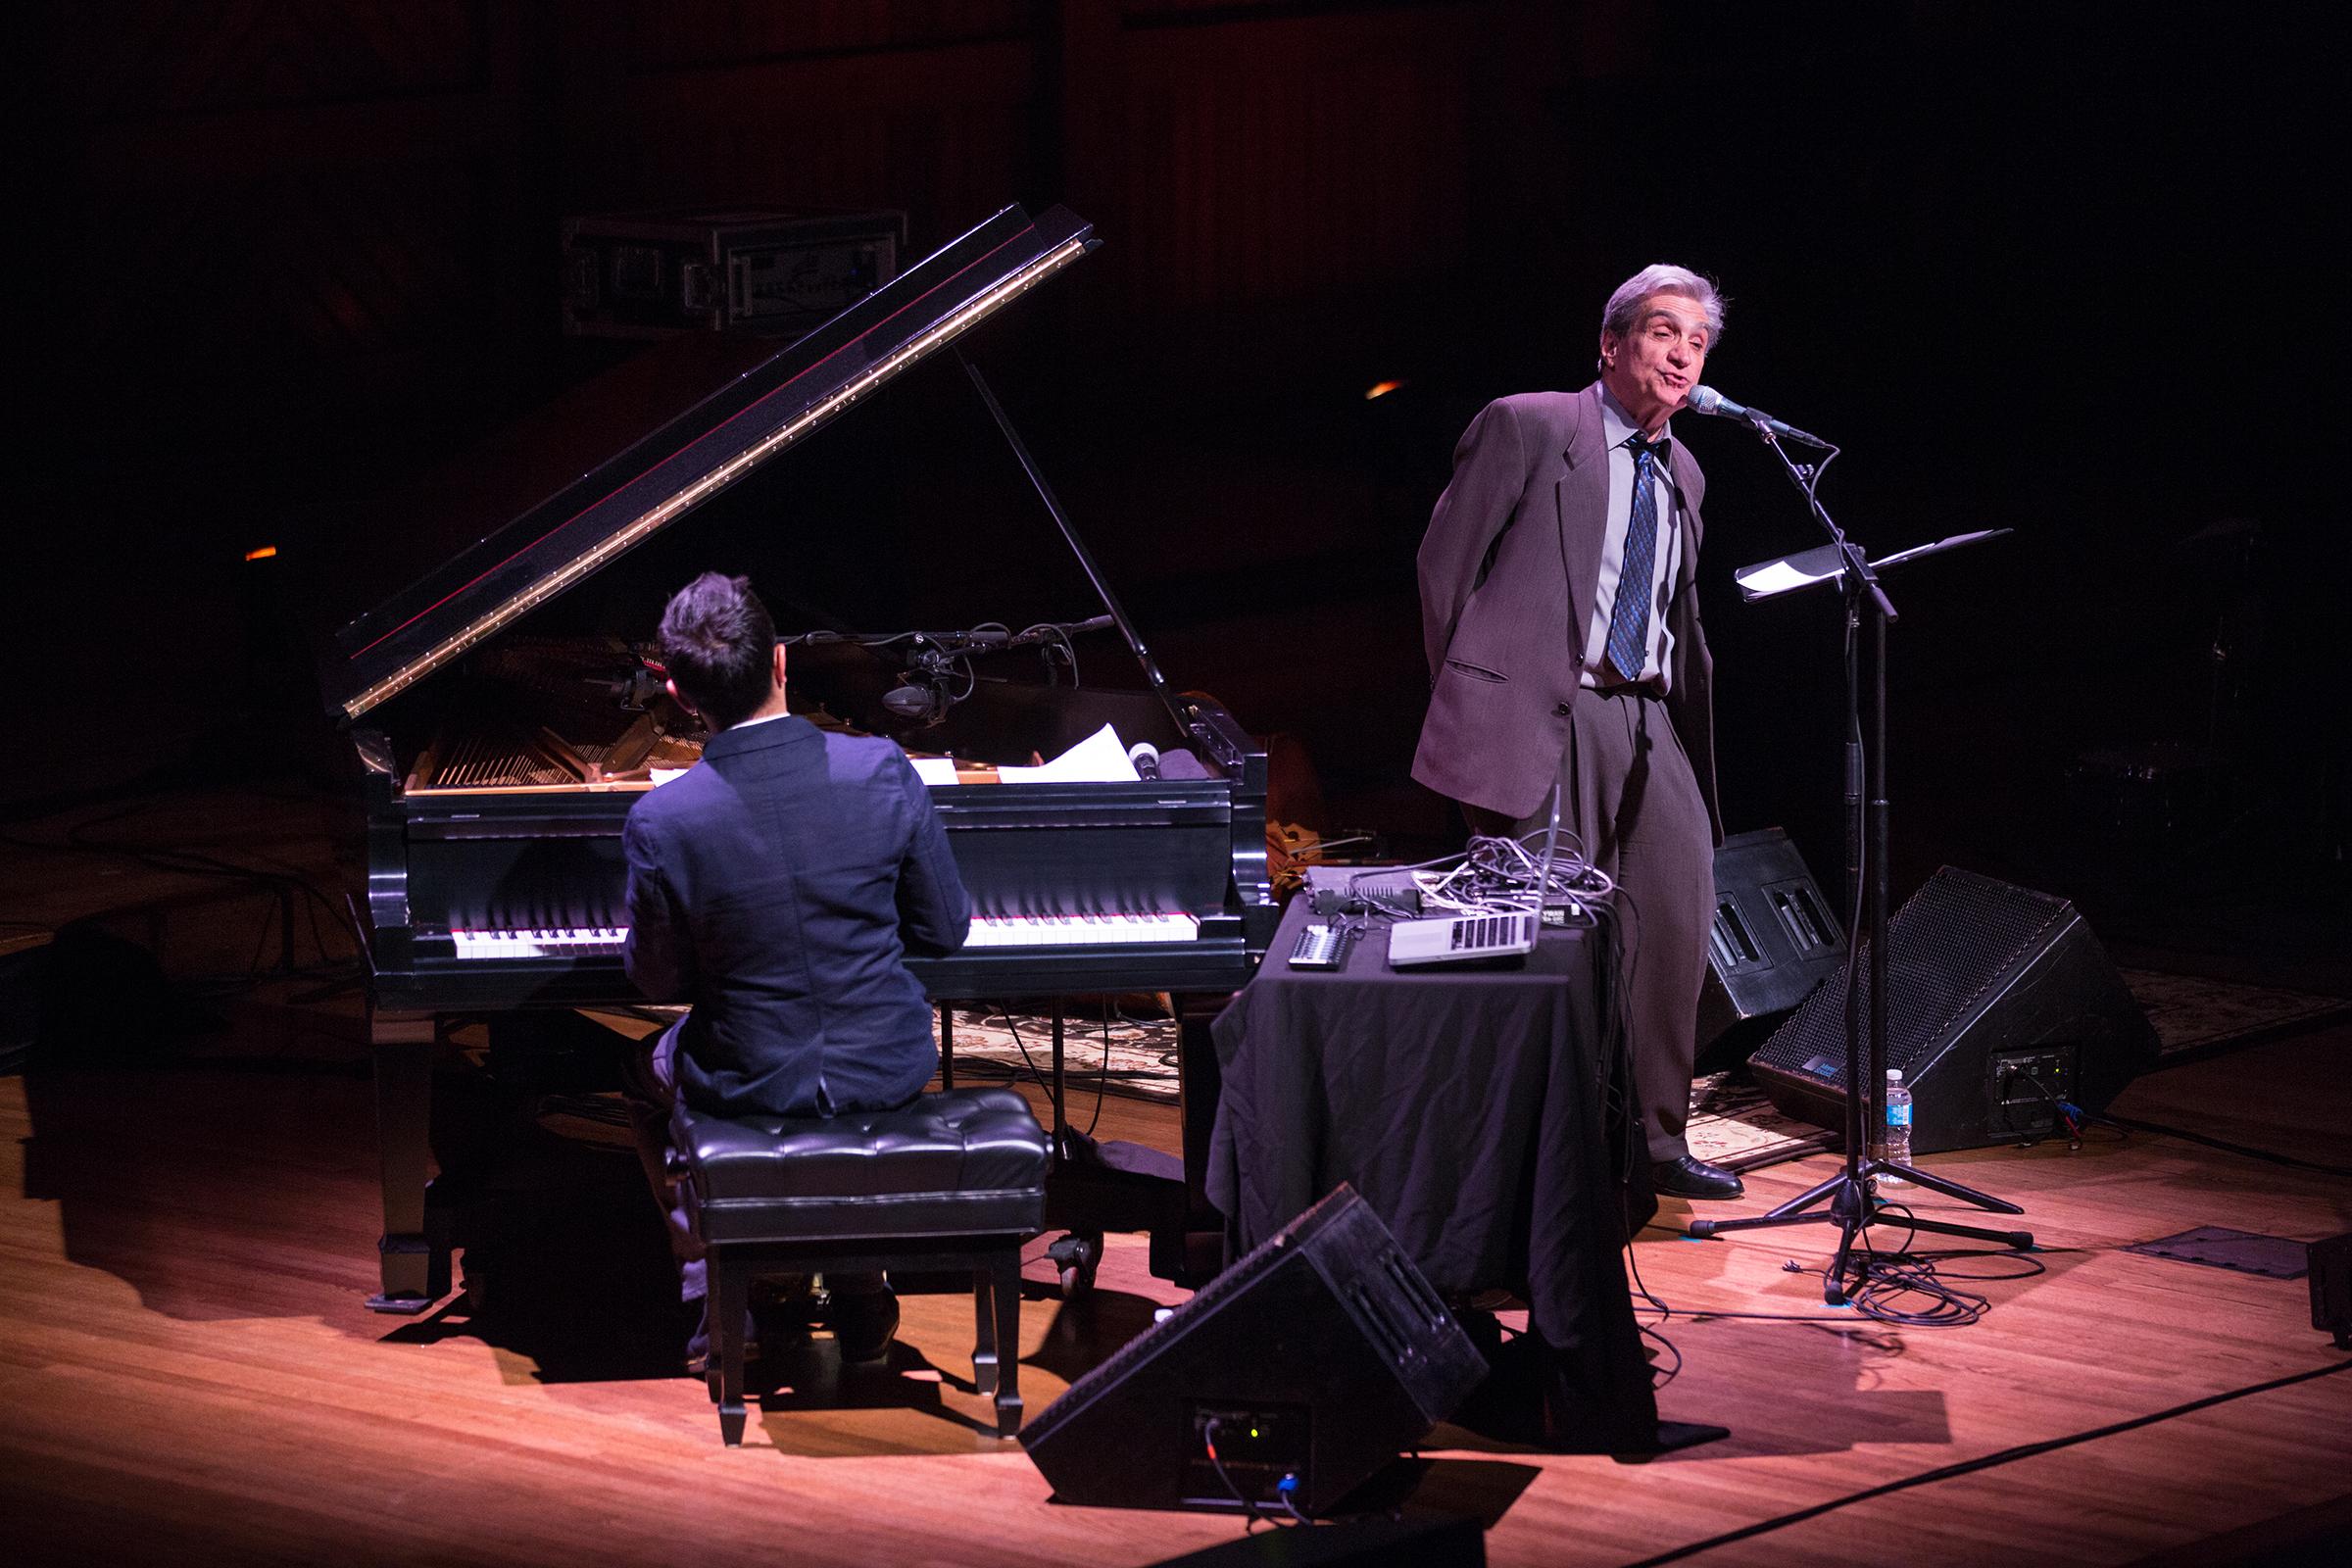 Music Diary: Iyer and Pinsky | Jon Garelick's Giant Steps